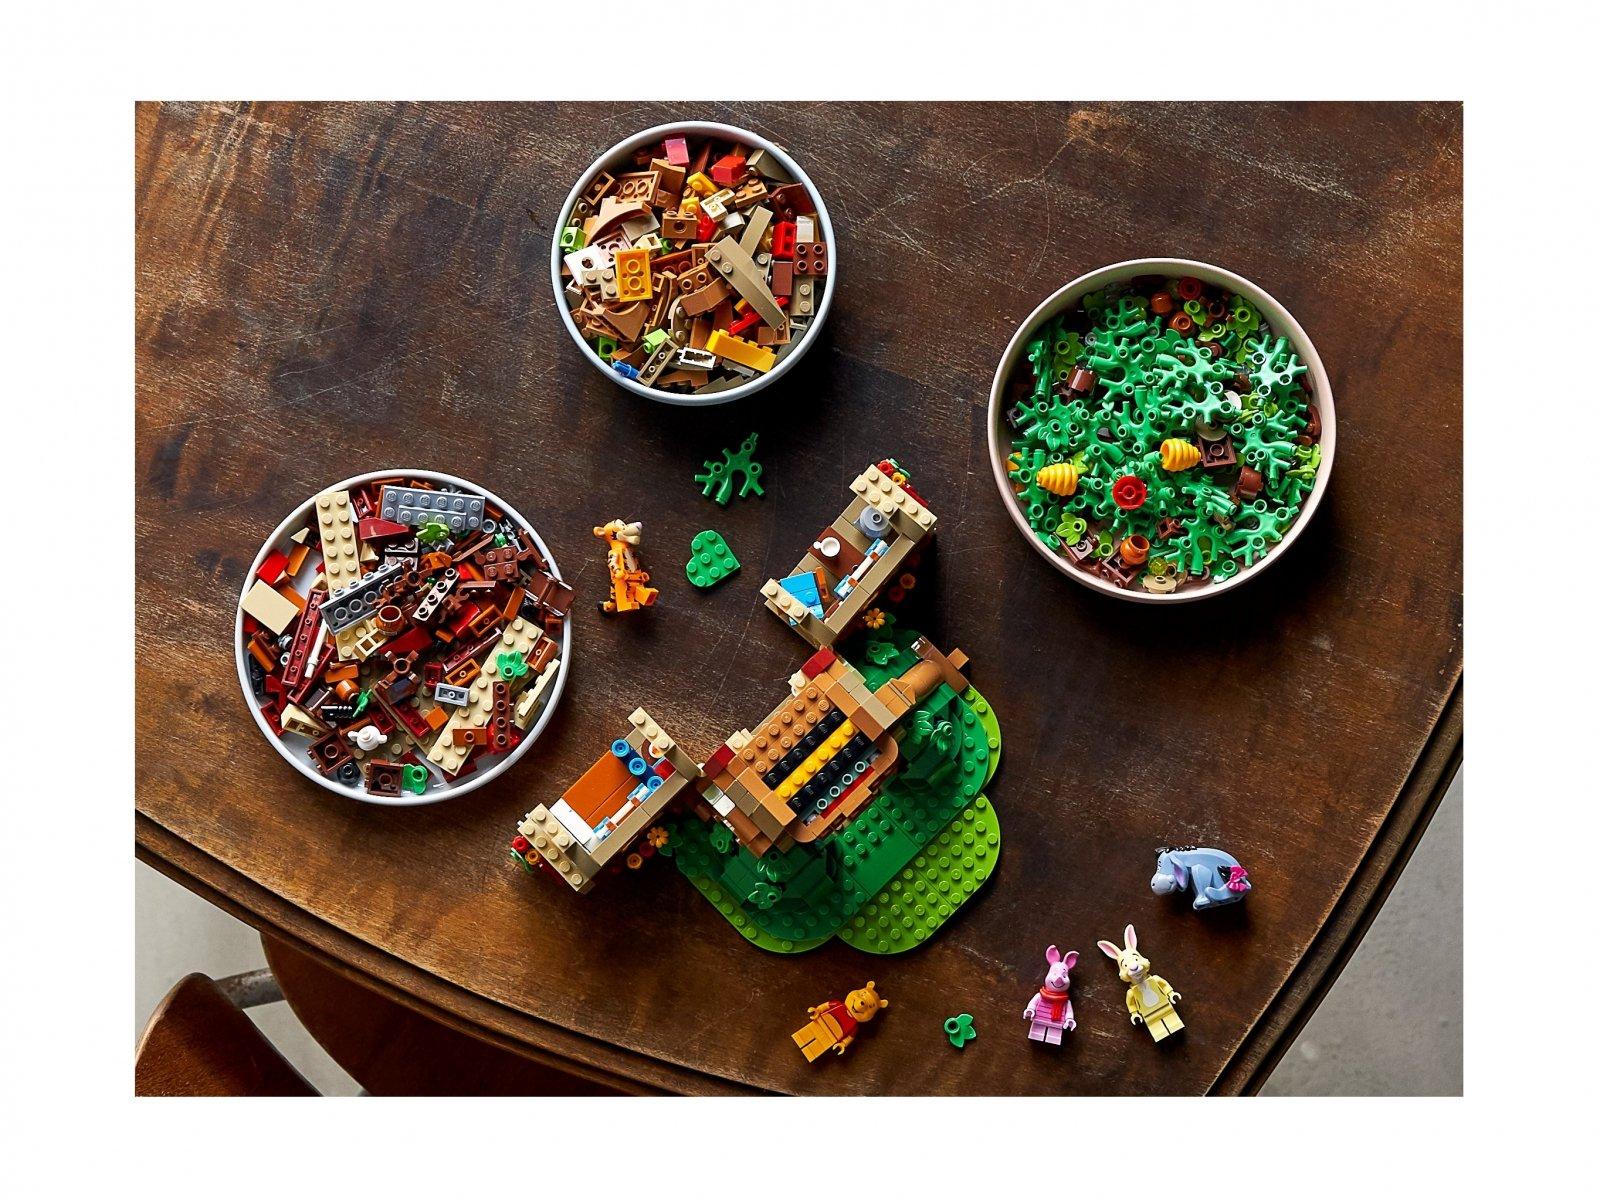 LEGO 21326 Kubuś Puchatek